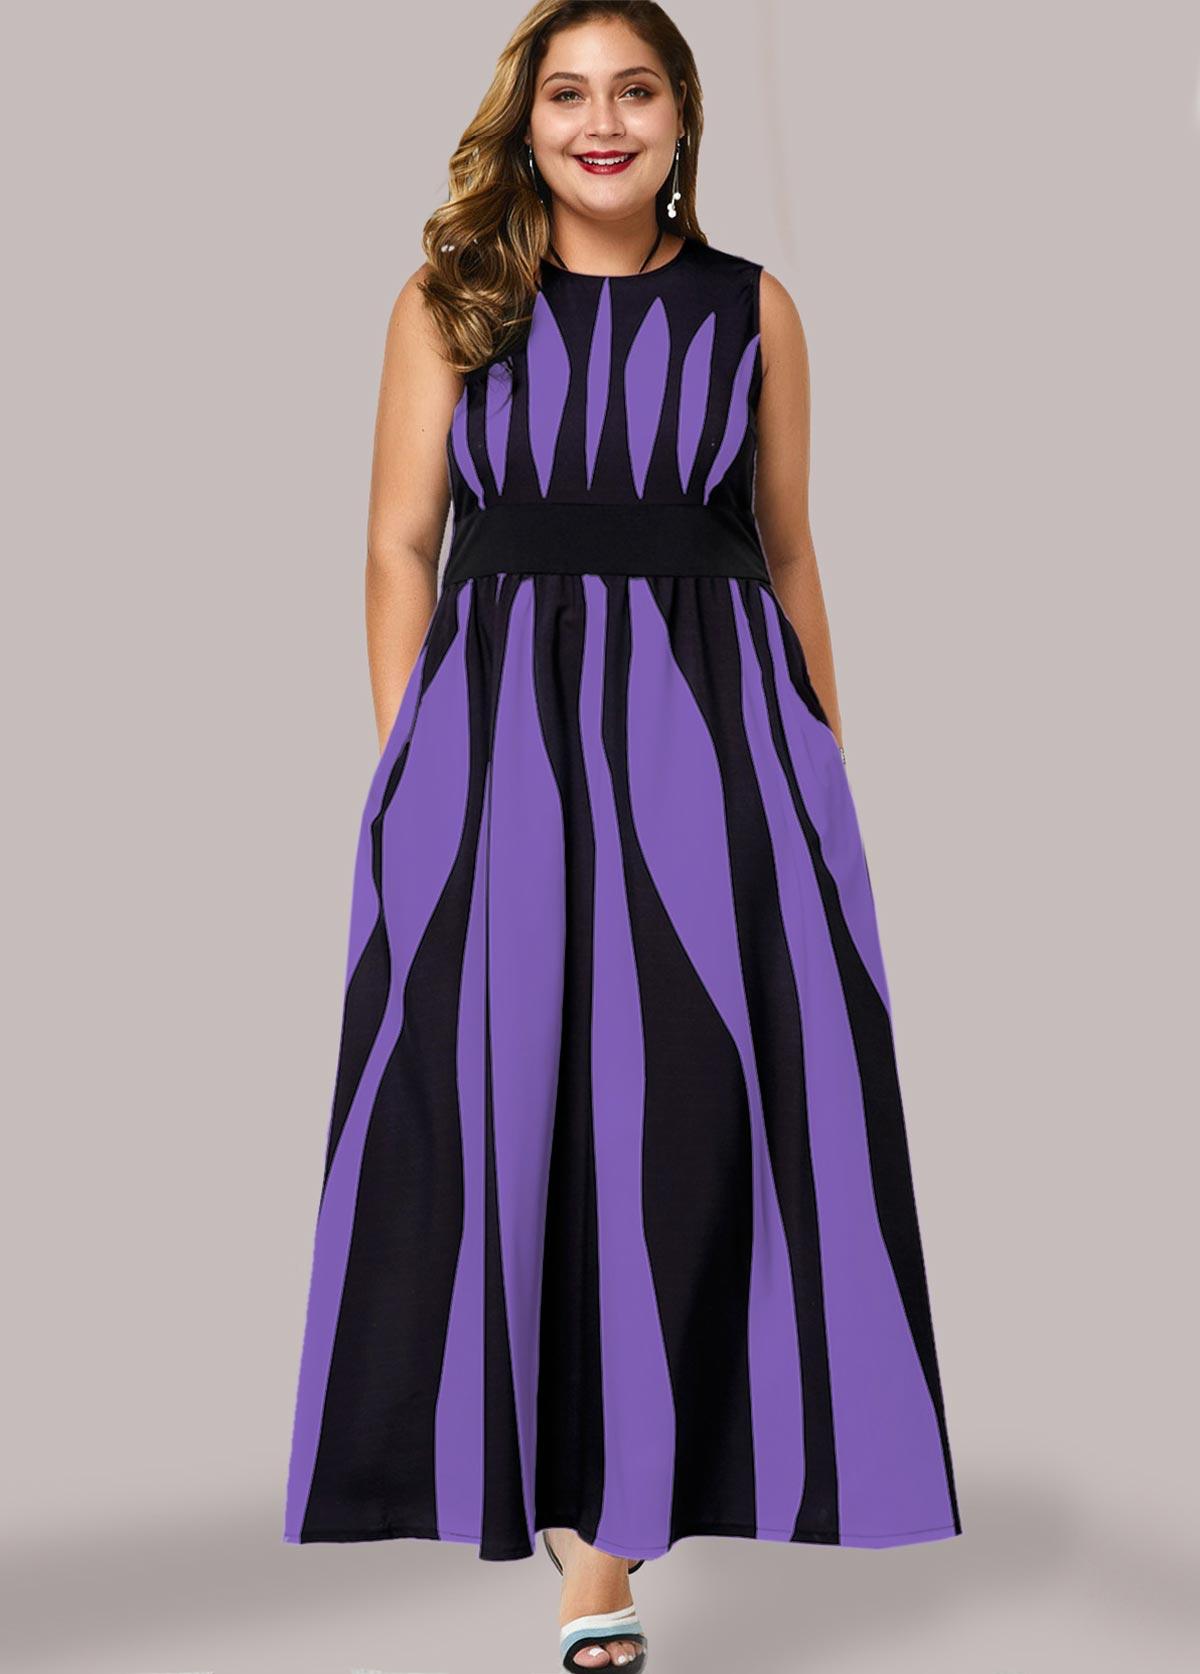 ROTITA Plus Size Side Pocket Zebra Print Maxi Dress